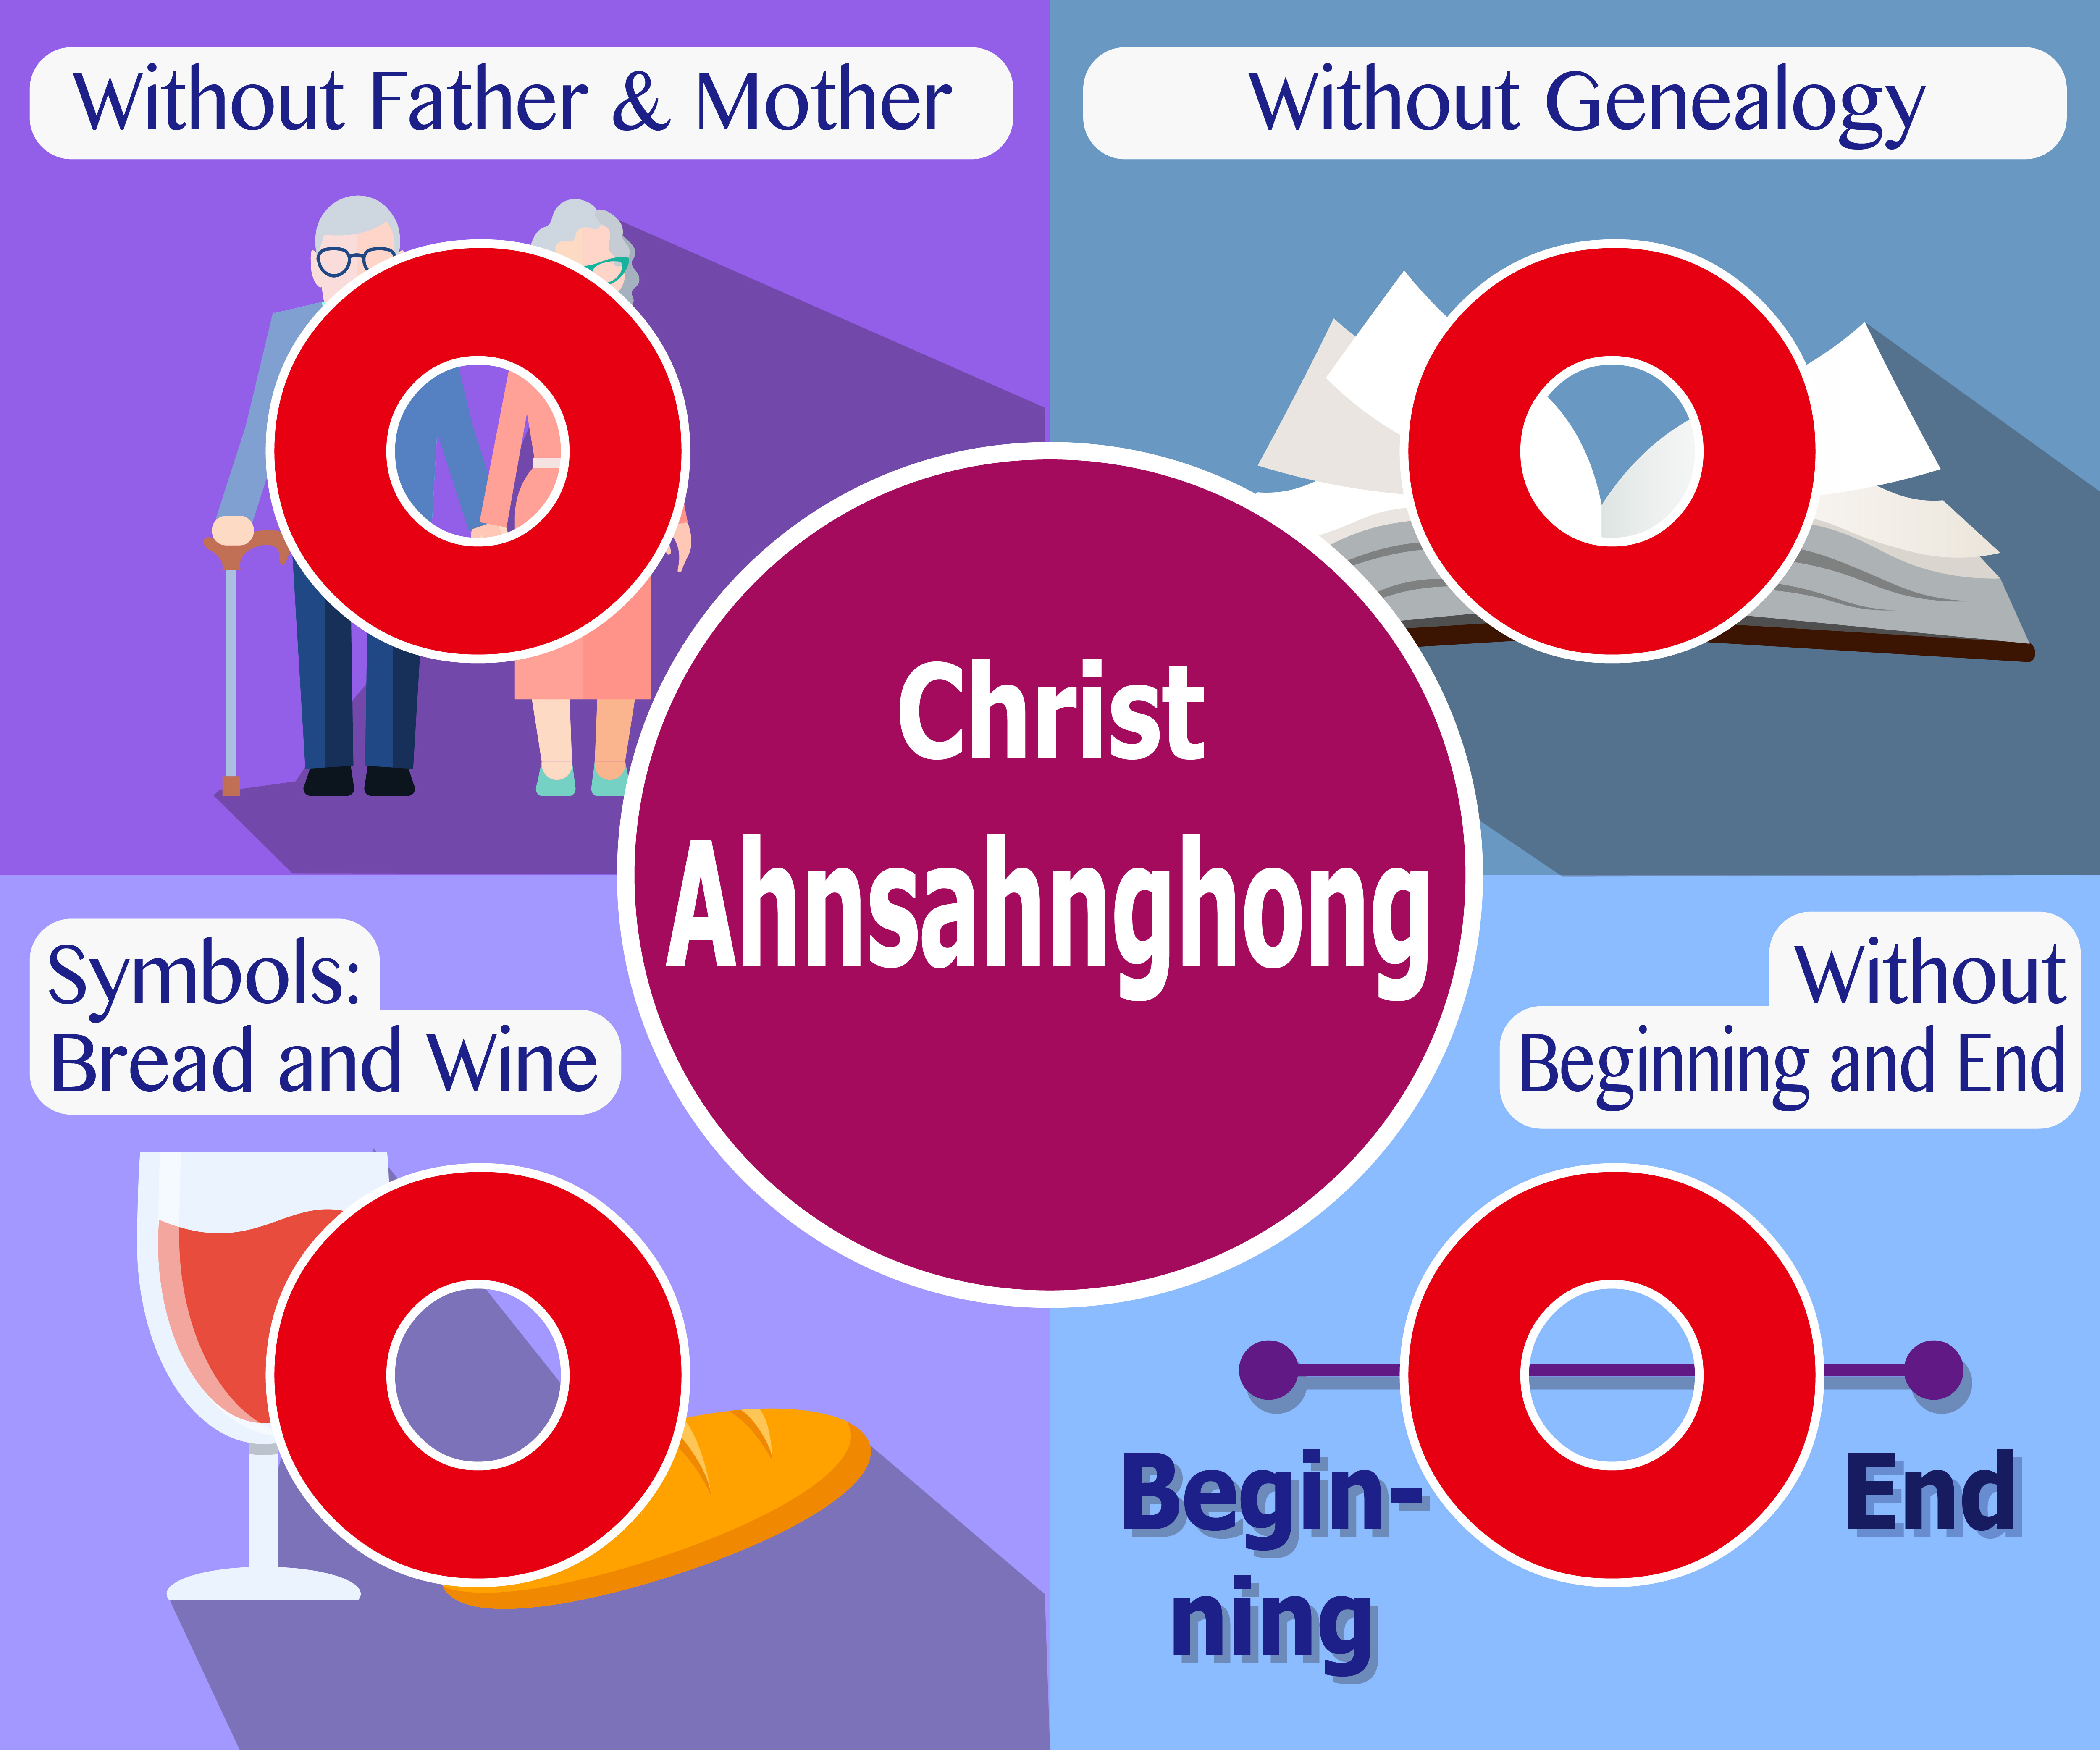 Ahnsahnghong coming as Melchizedek